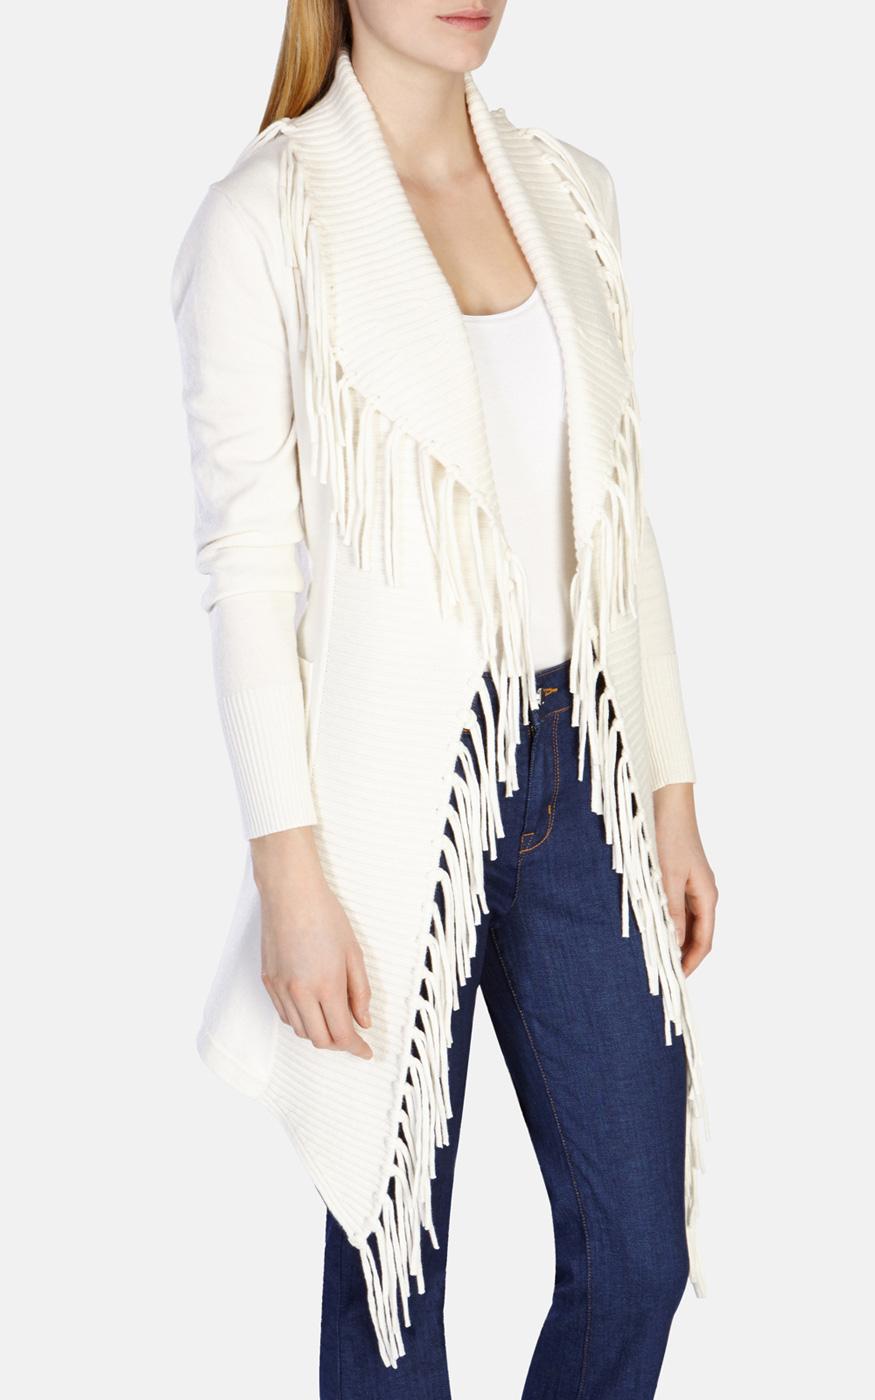 Karen Millen Cashmere Fringed Knit Long Cardigan in White